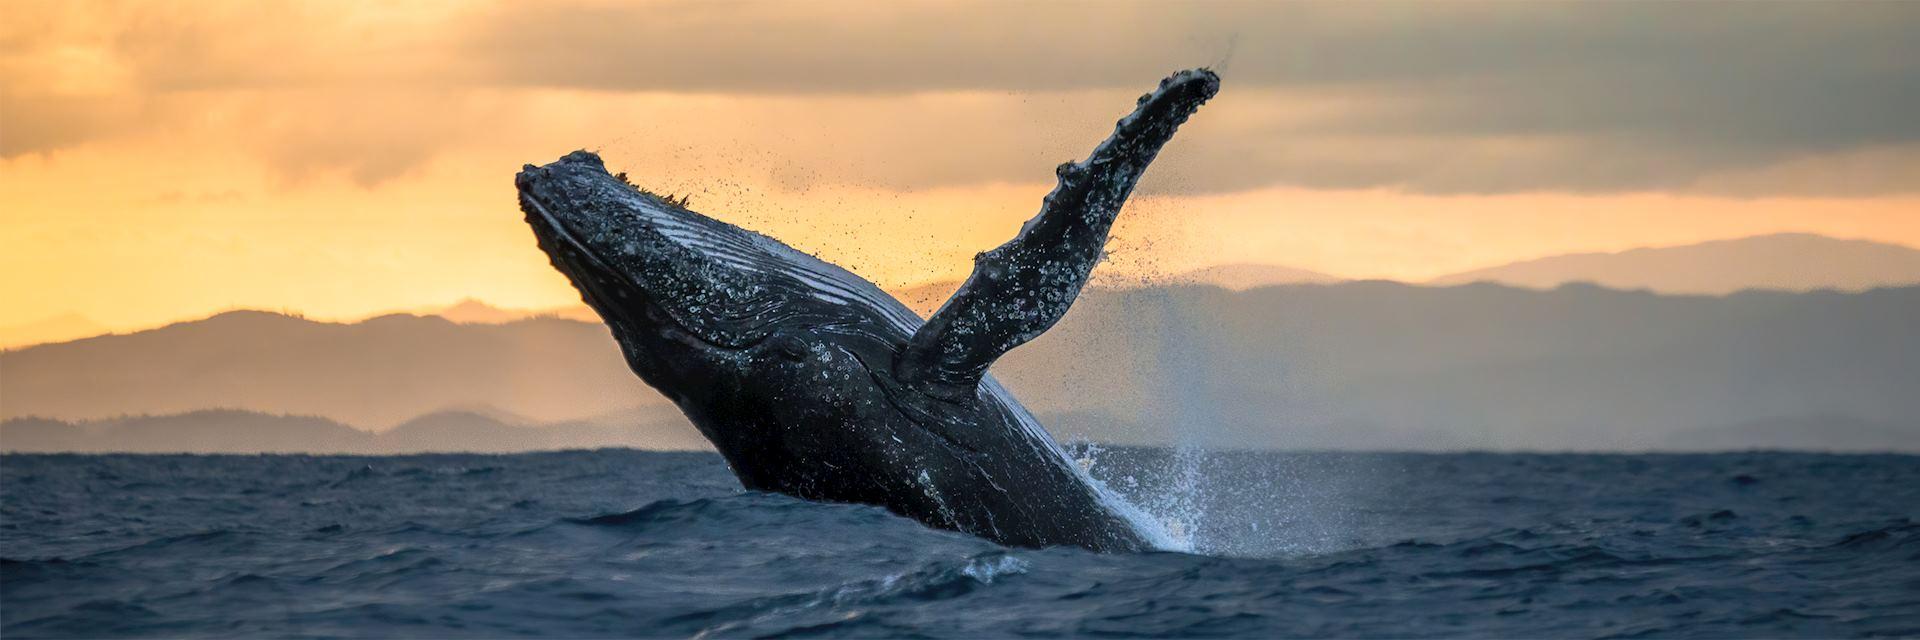 Humpback whale, Île Sainte-Marie